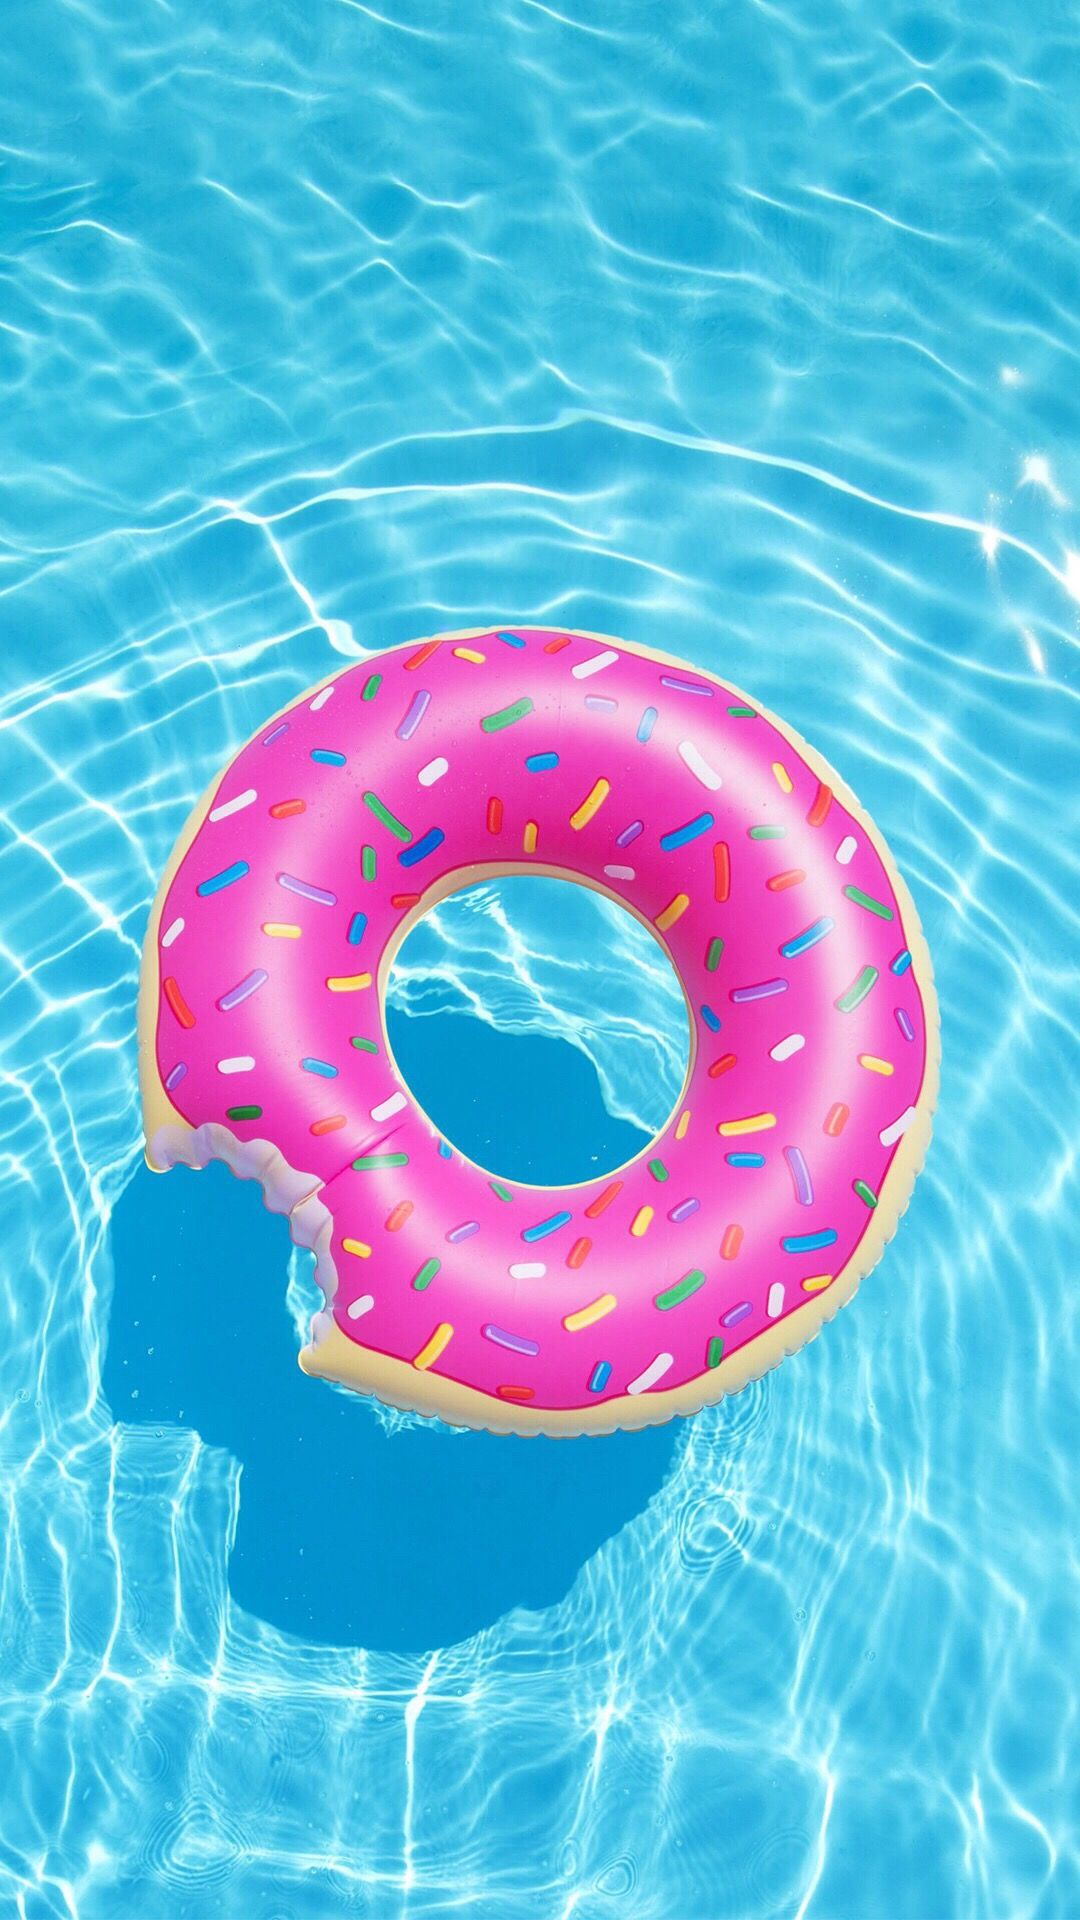 pool water background tumblr. Doughnut Inflatable In Pool Water Background Tumblr E